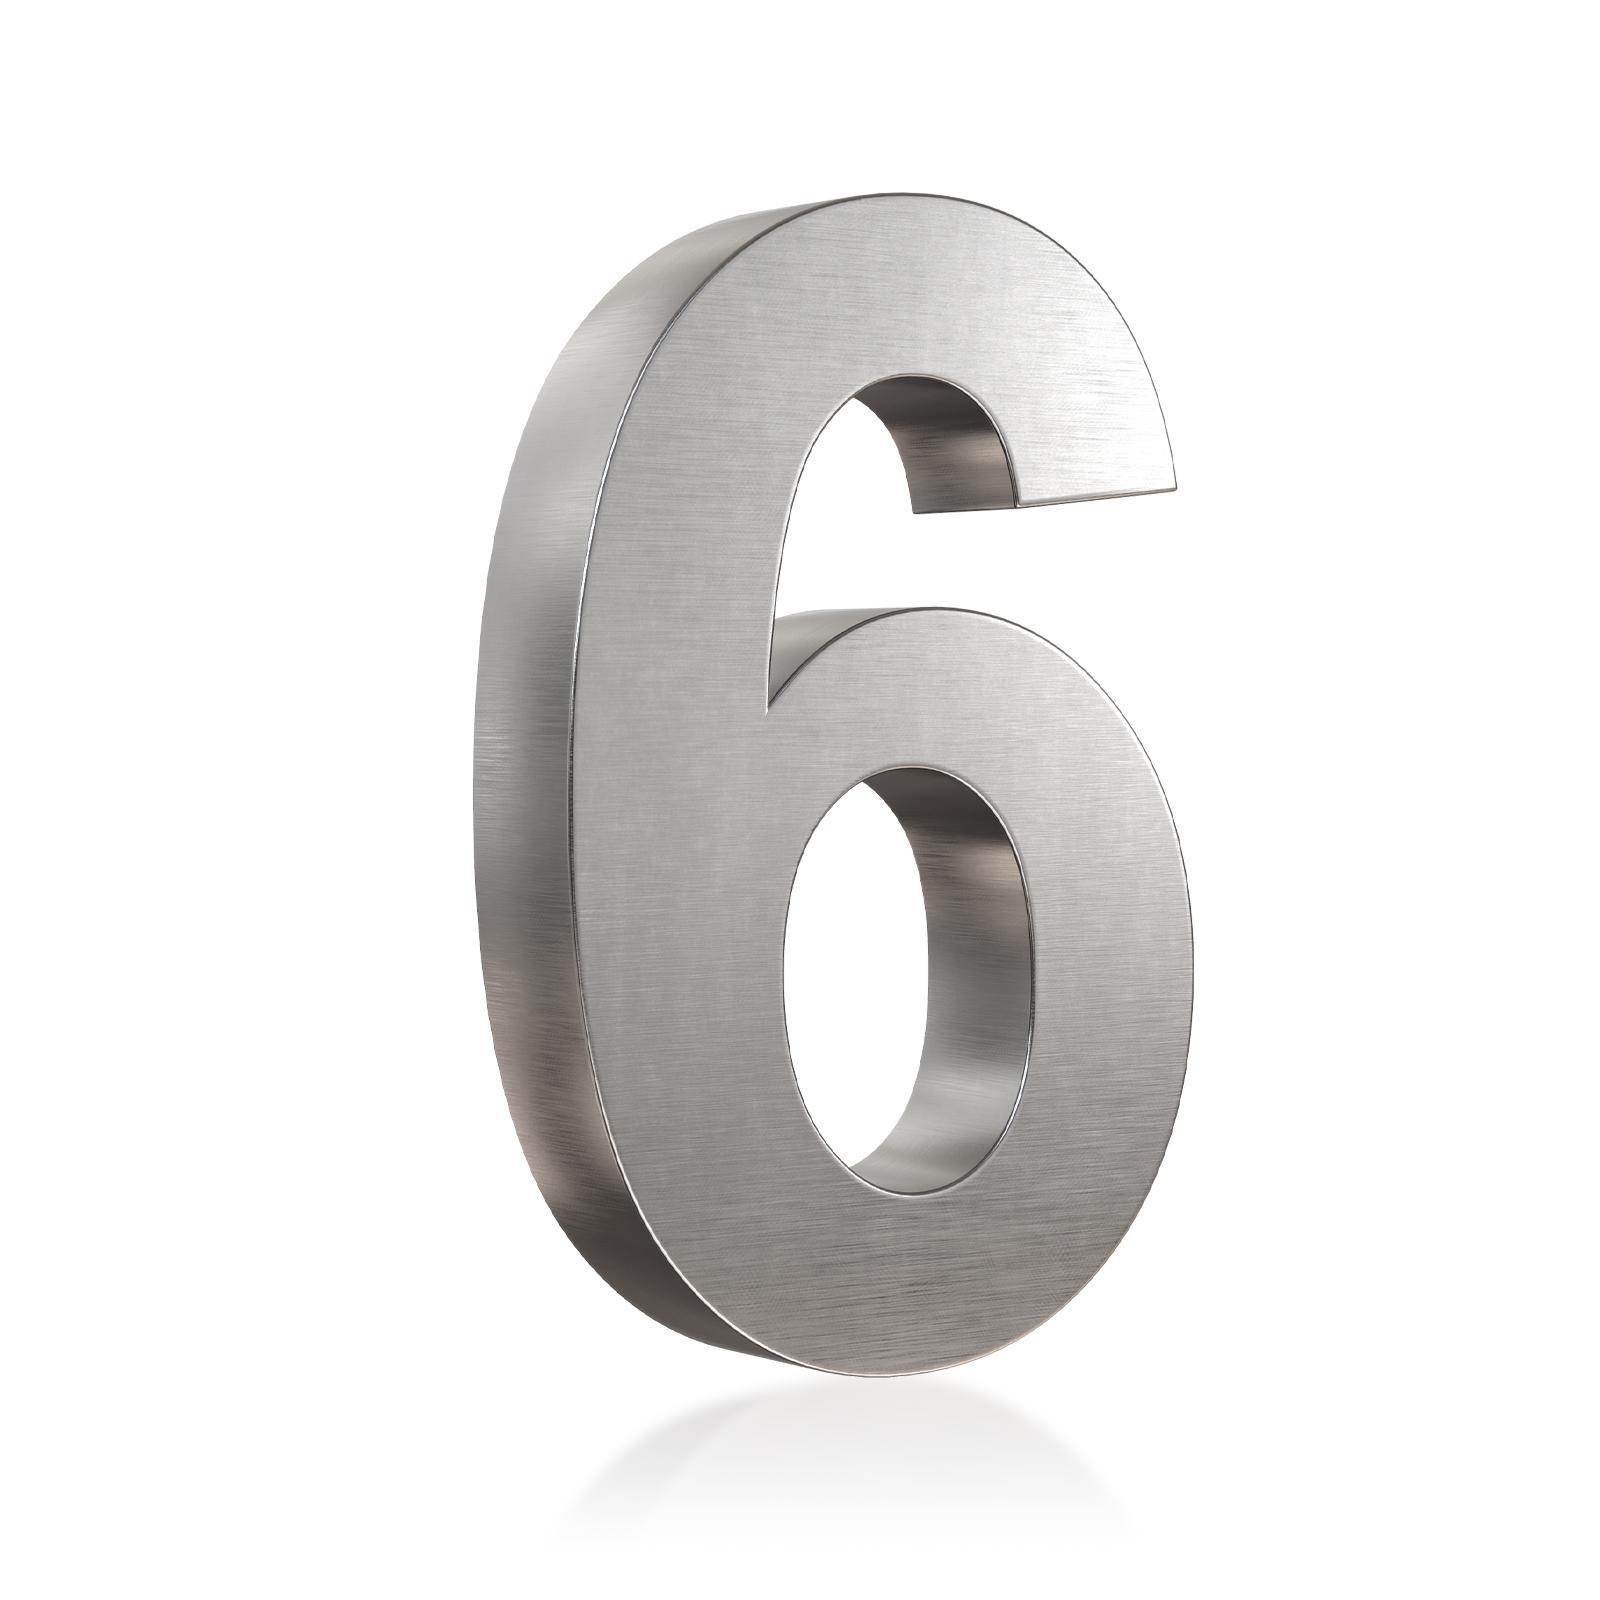 3D Hausnummer 6 Edelstahl in 3D Design Arial V2A